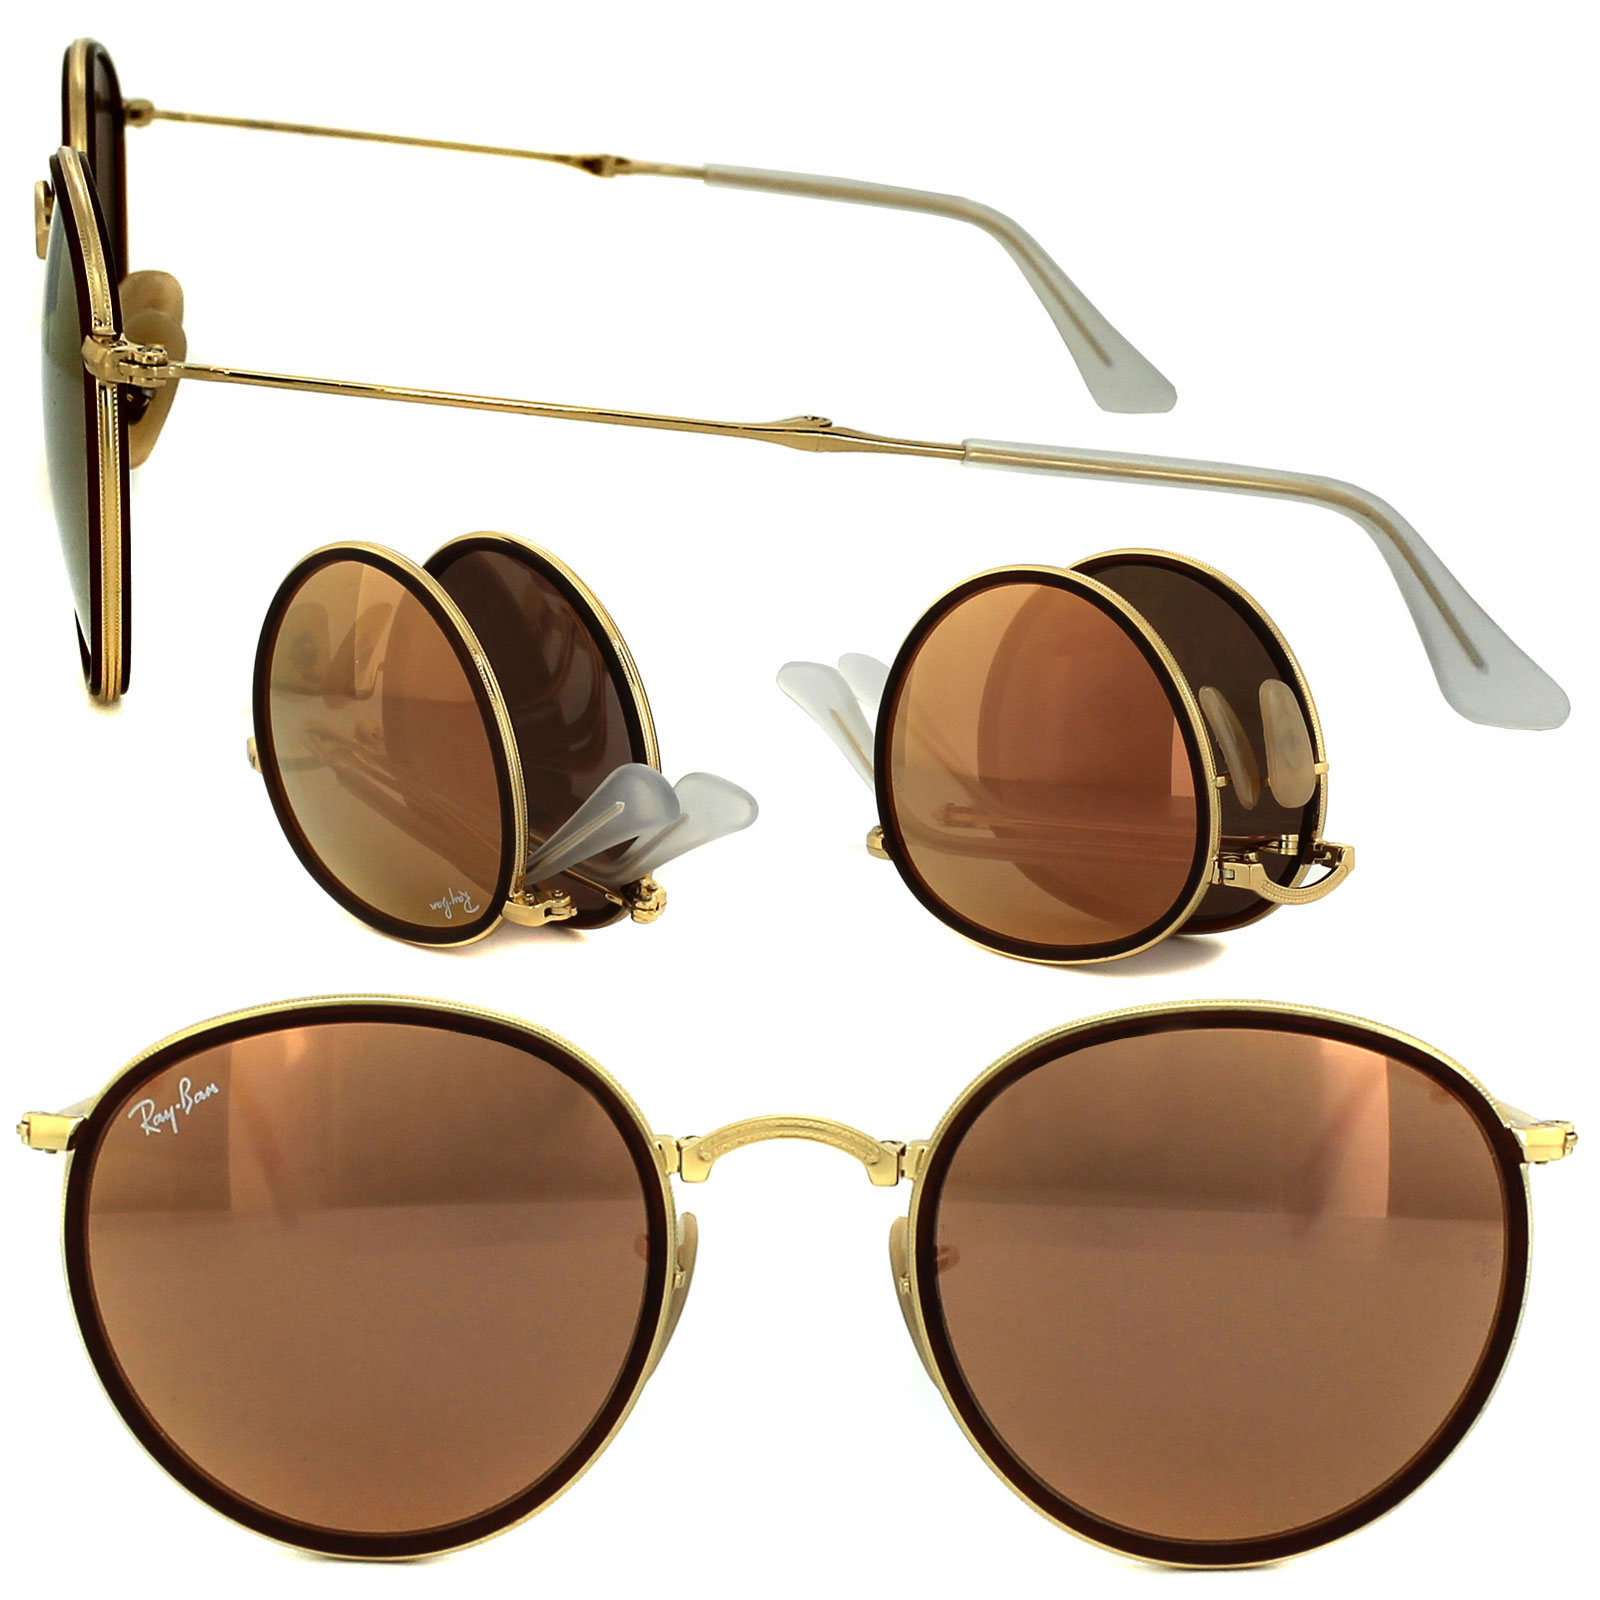 Ray-Ban Sunglasses Round Folding 3517 001/Z2 Gold Copper ...